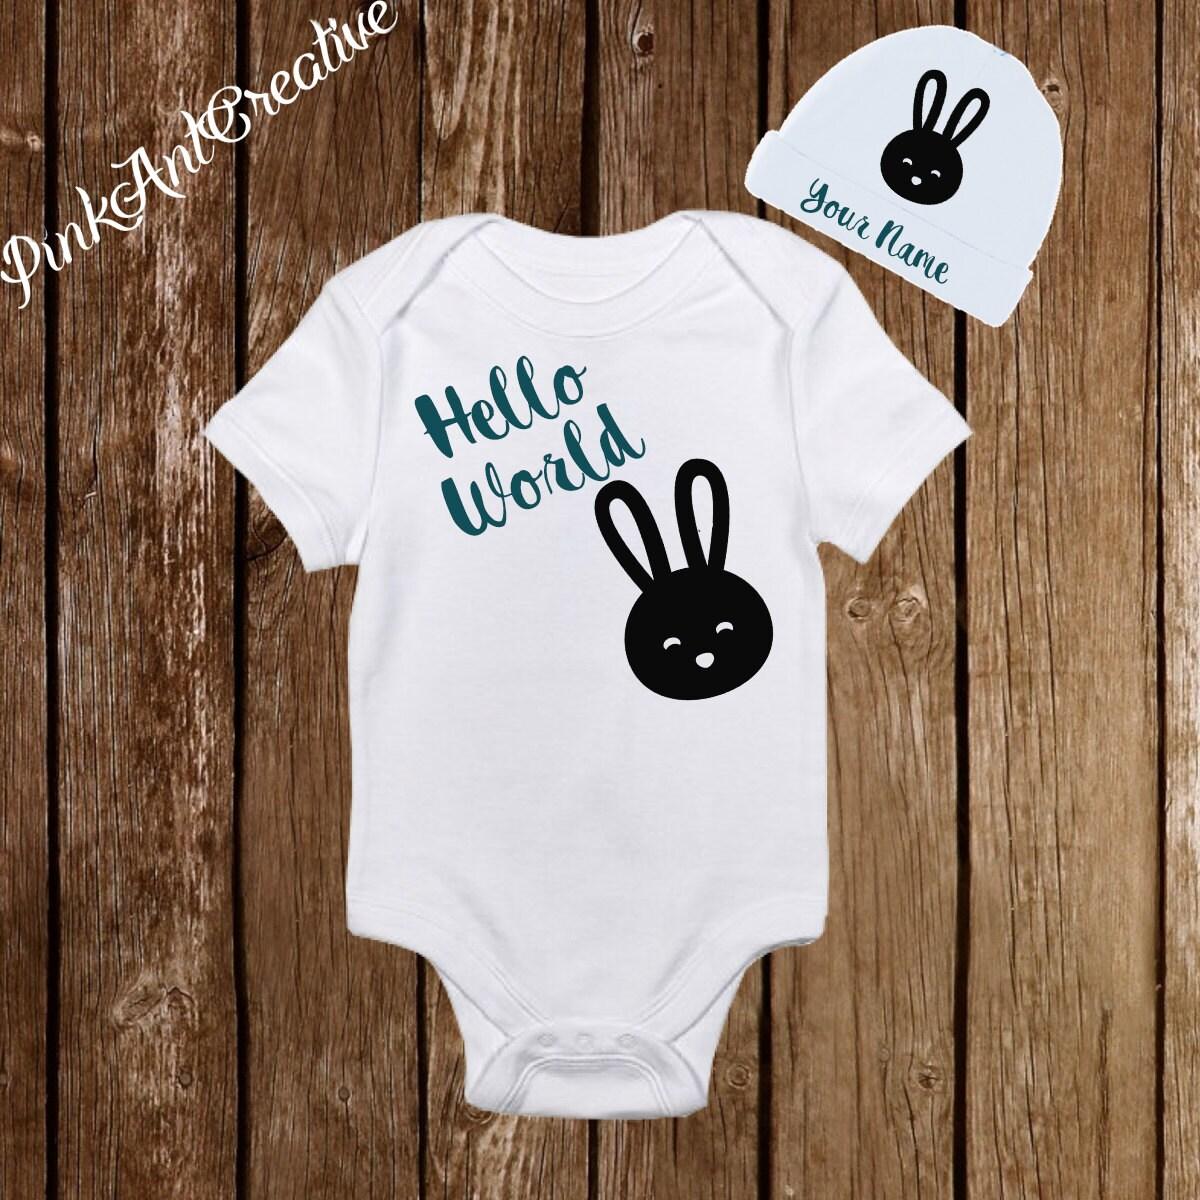 9f2d18e6126d Baby Boys  Clothing